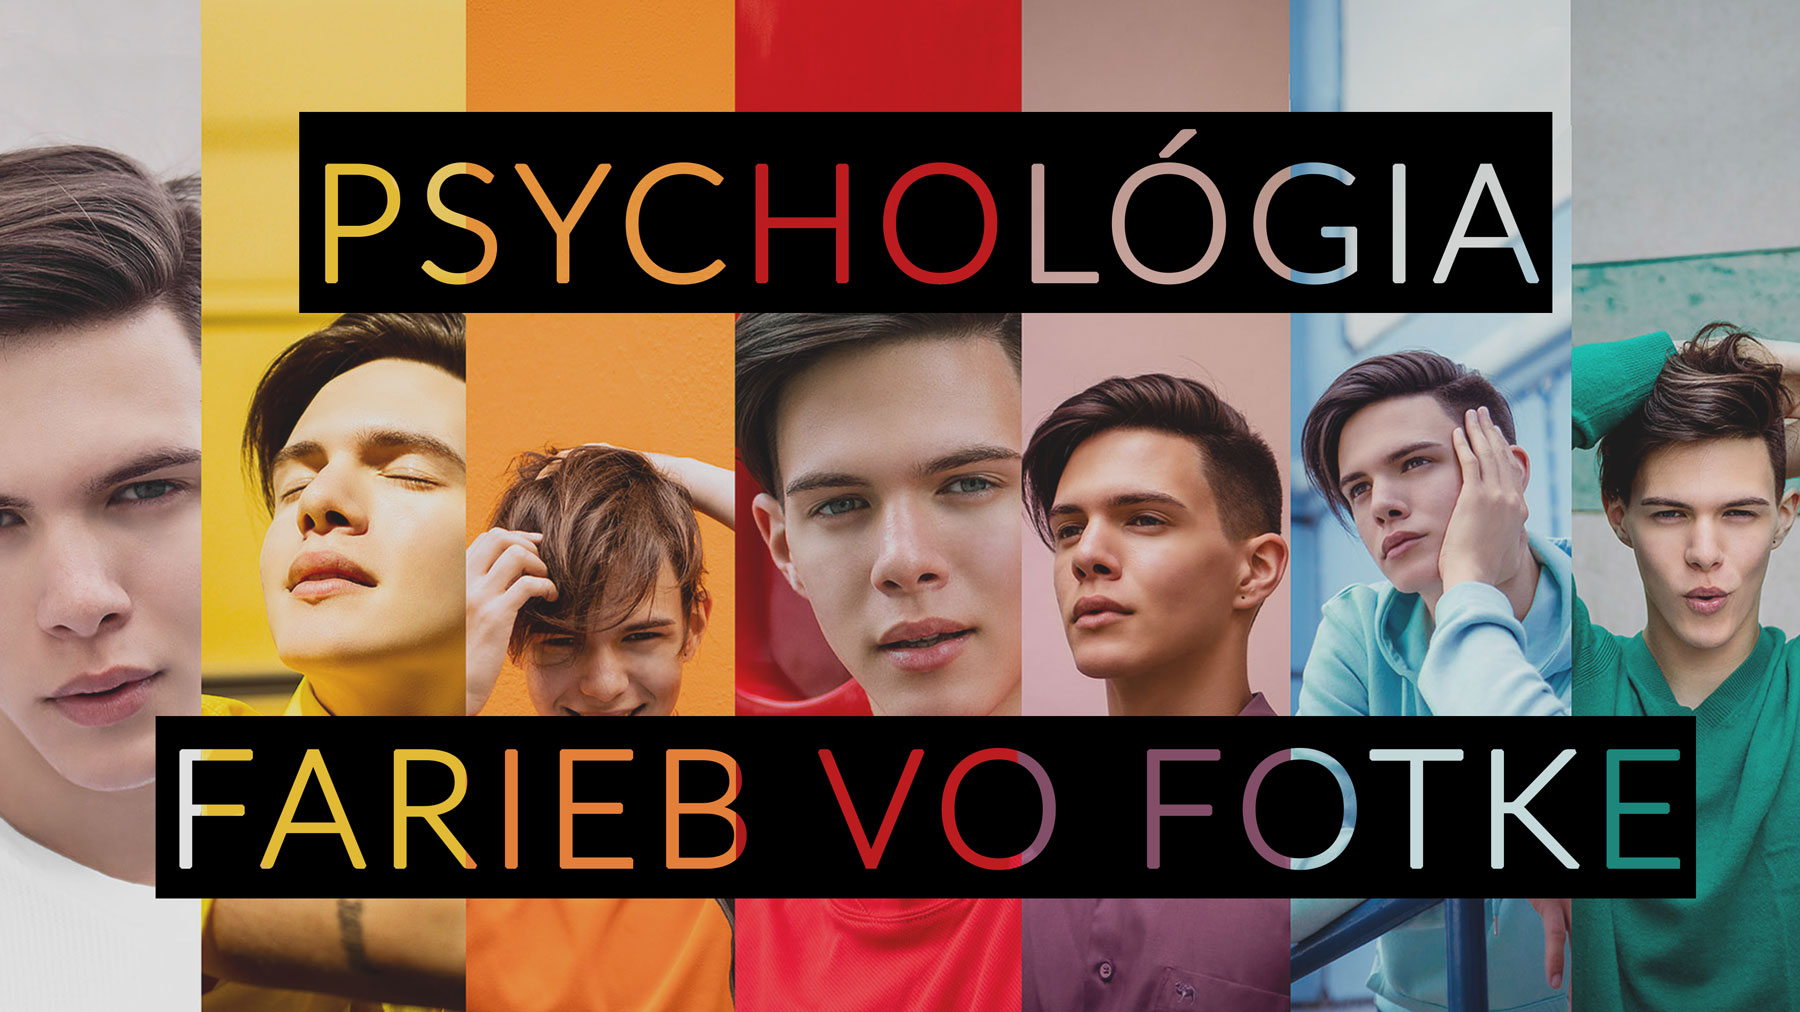 psychológia farieb vo fotke